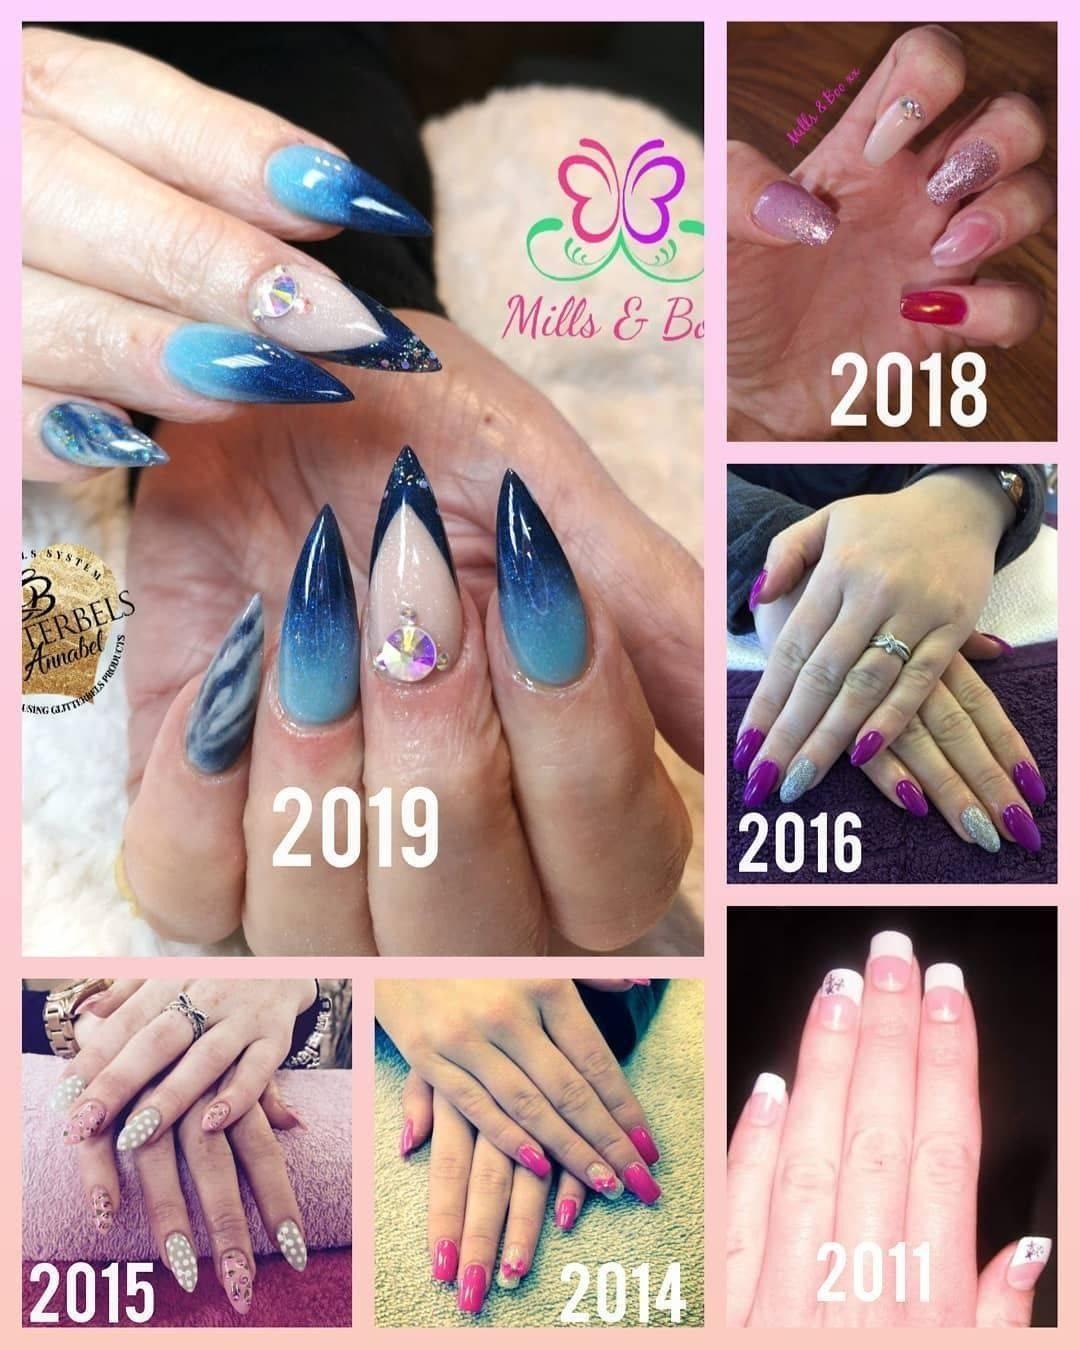 Progression through my Nail Career since 2011 to Now!    Always Learning Never give up!   @millsandboobeauty @kirsty88millie   #nailtechgoals #nailtechnails #nailtechlife #lovemyjob